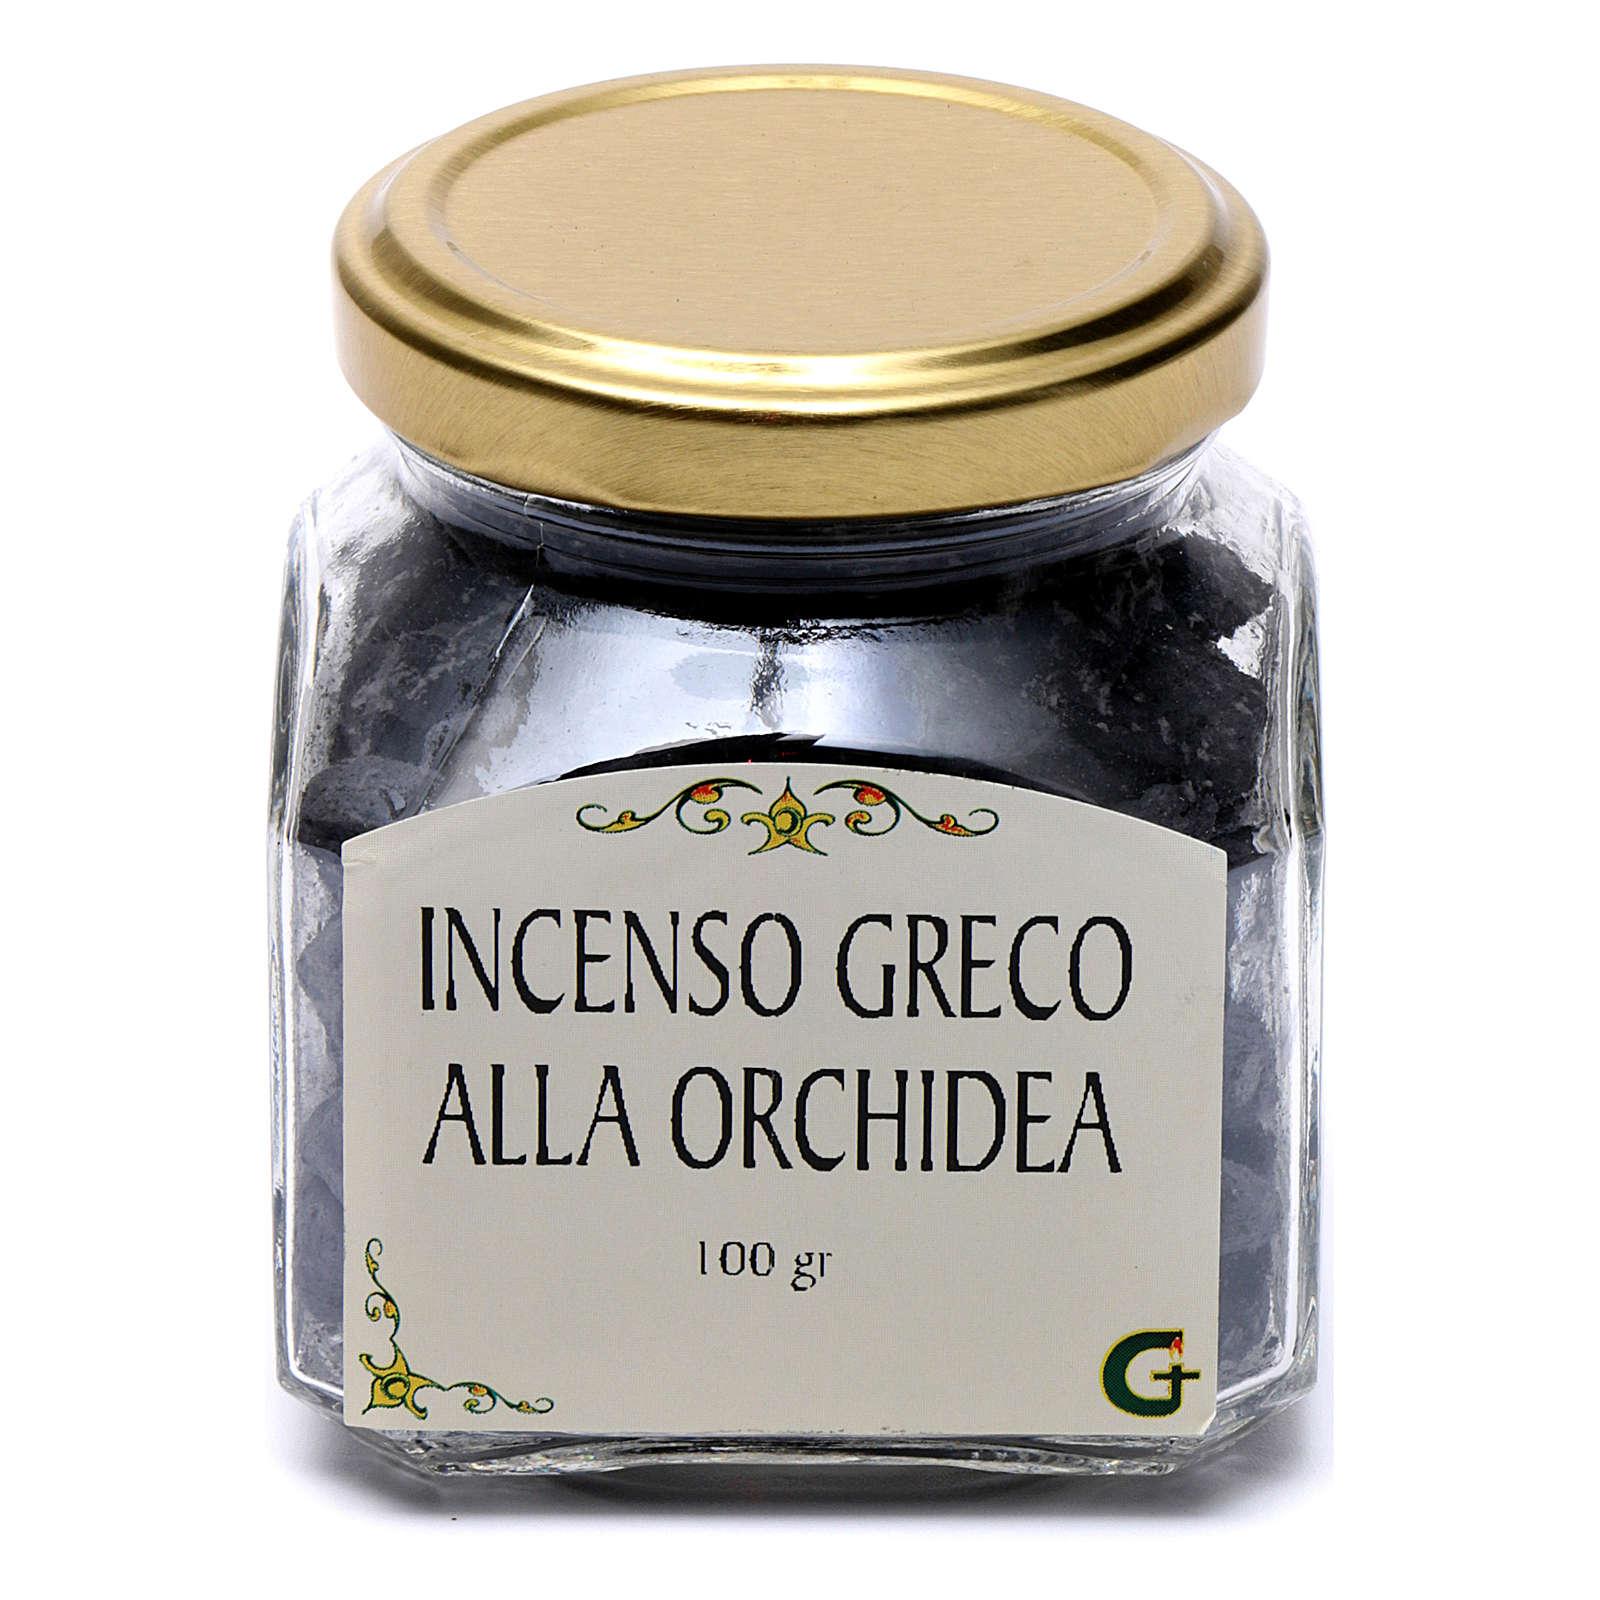 Incenso greco all'orchidea 100 gr Monte Athos 3